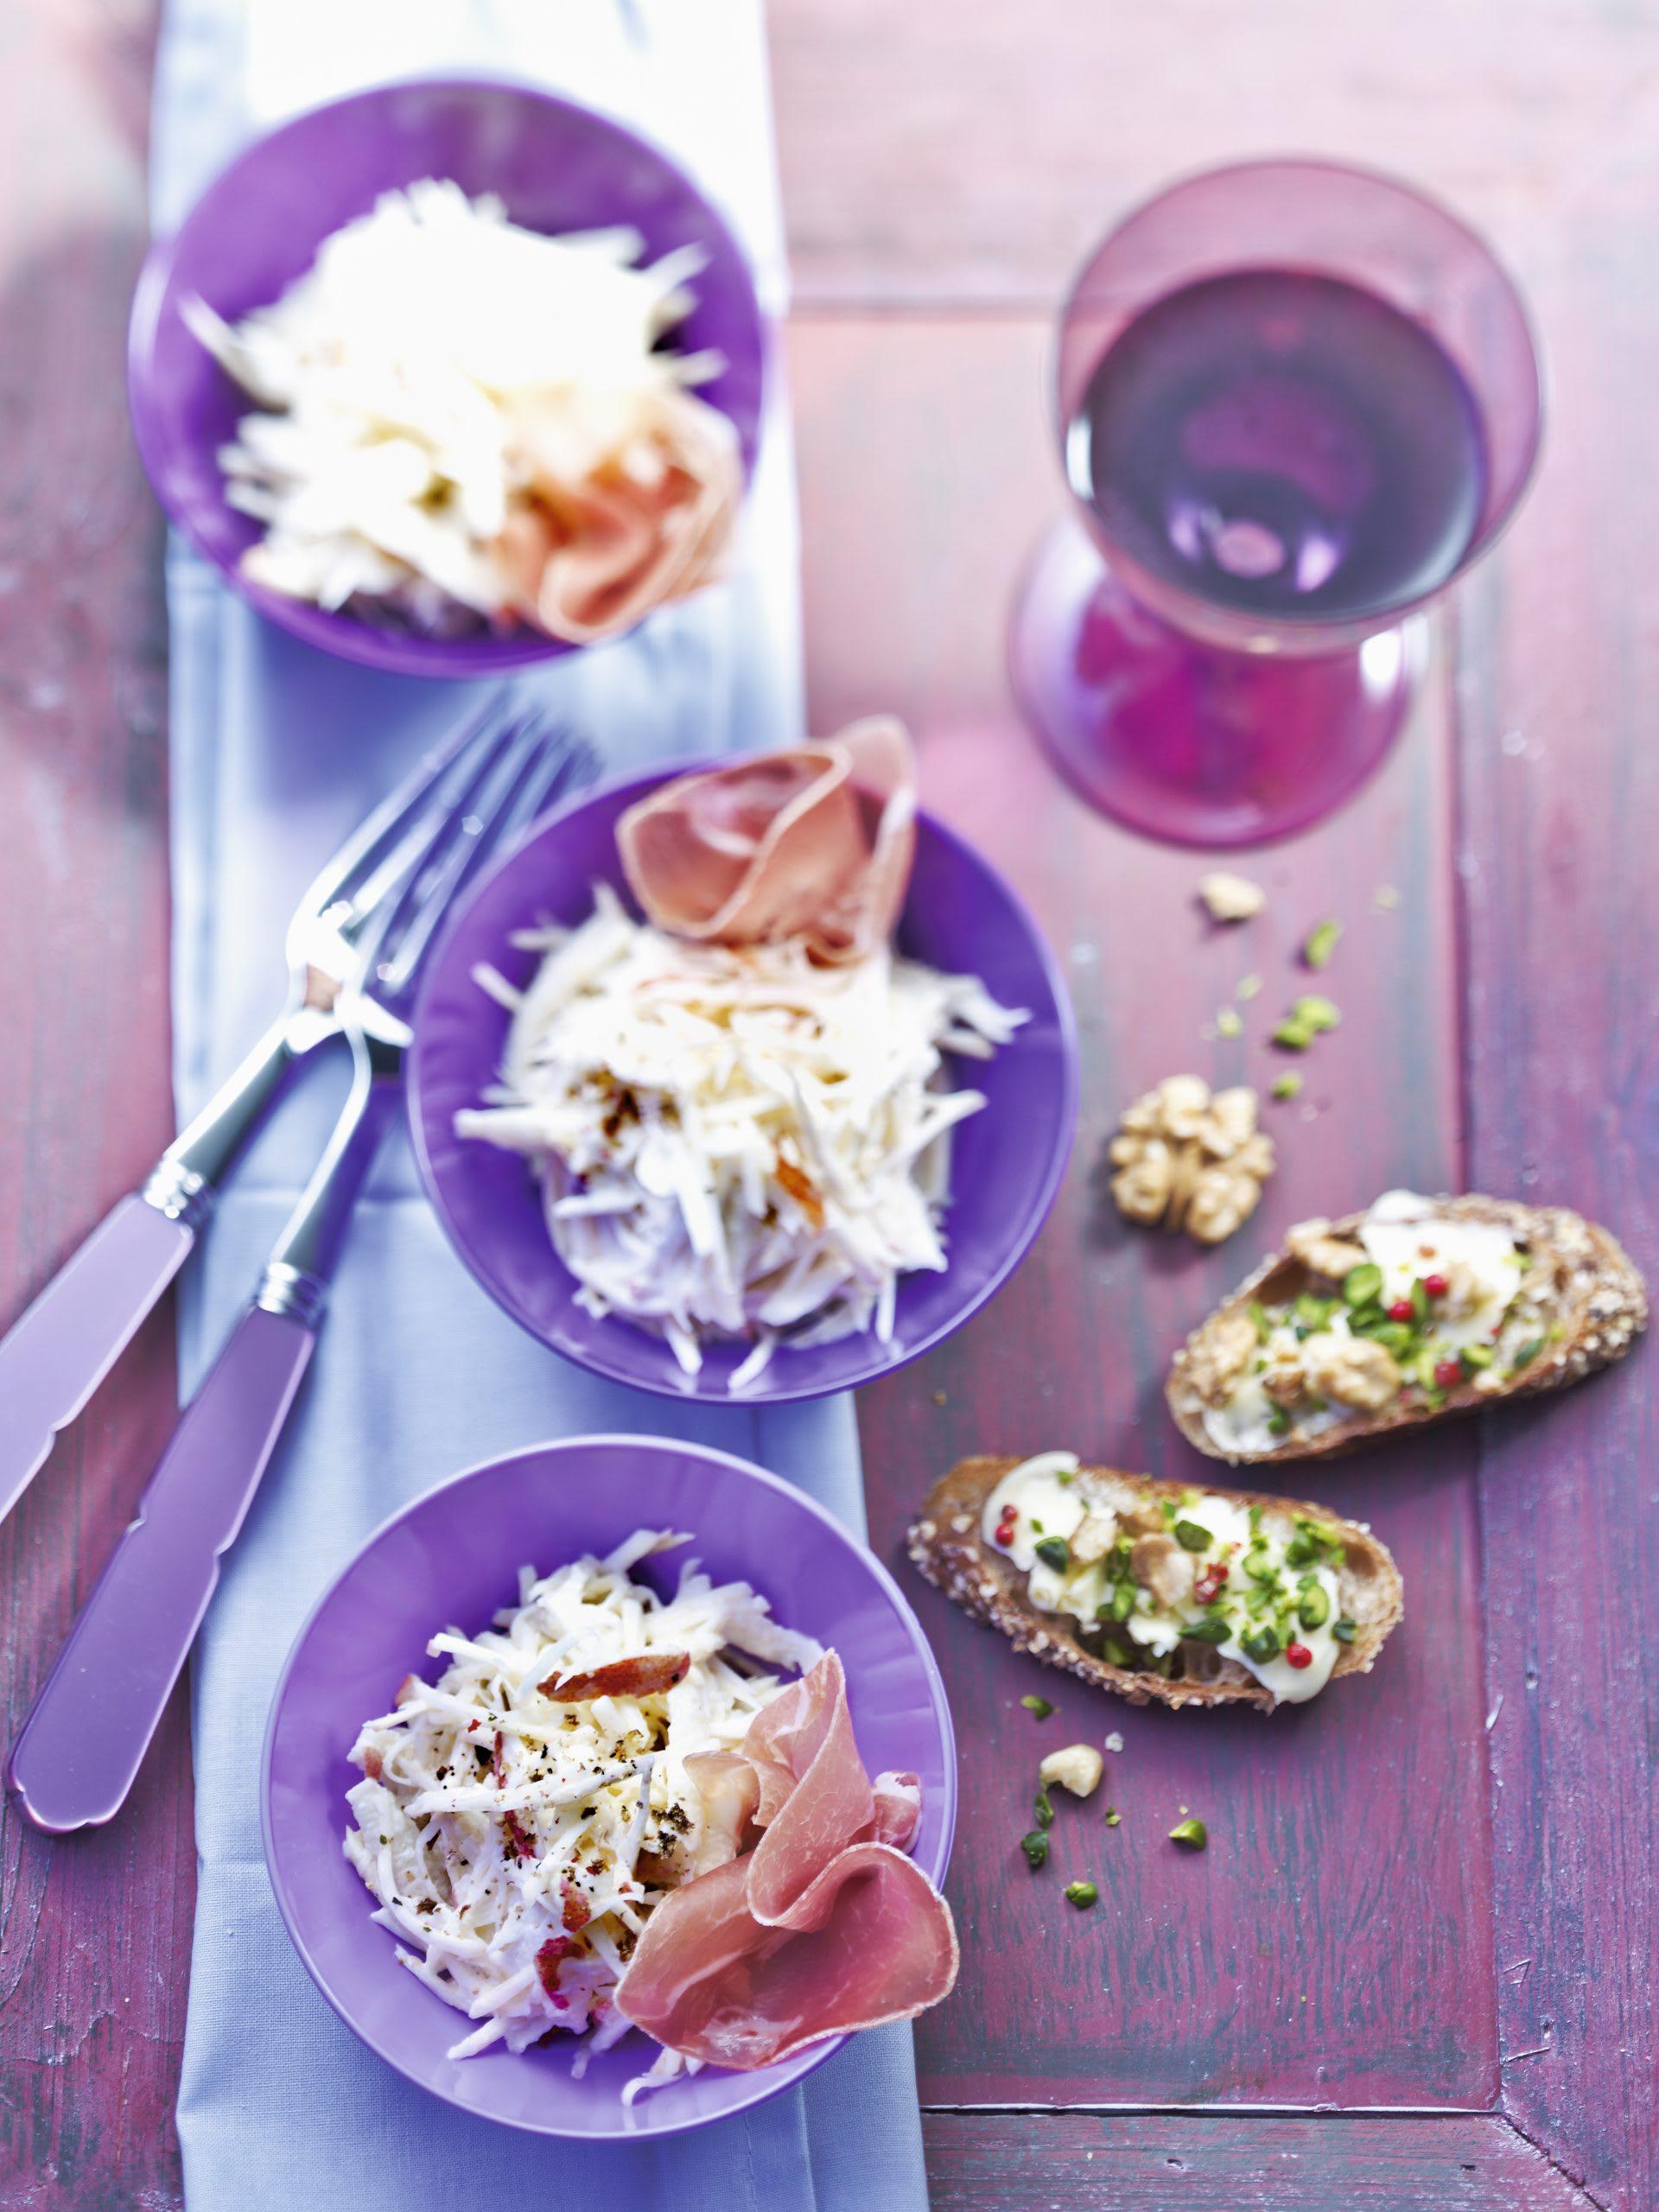 Sellerie-Apfel-Salat mit Nussbrot